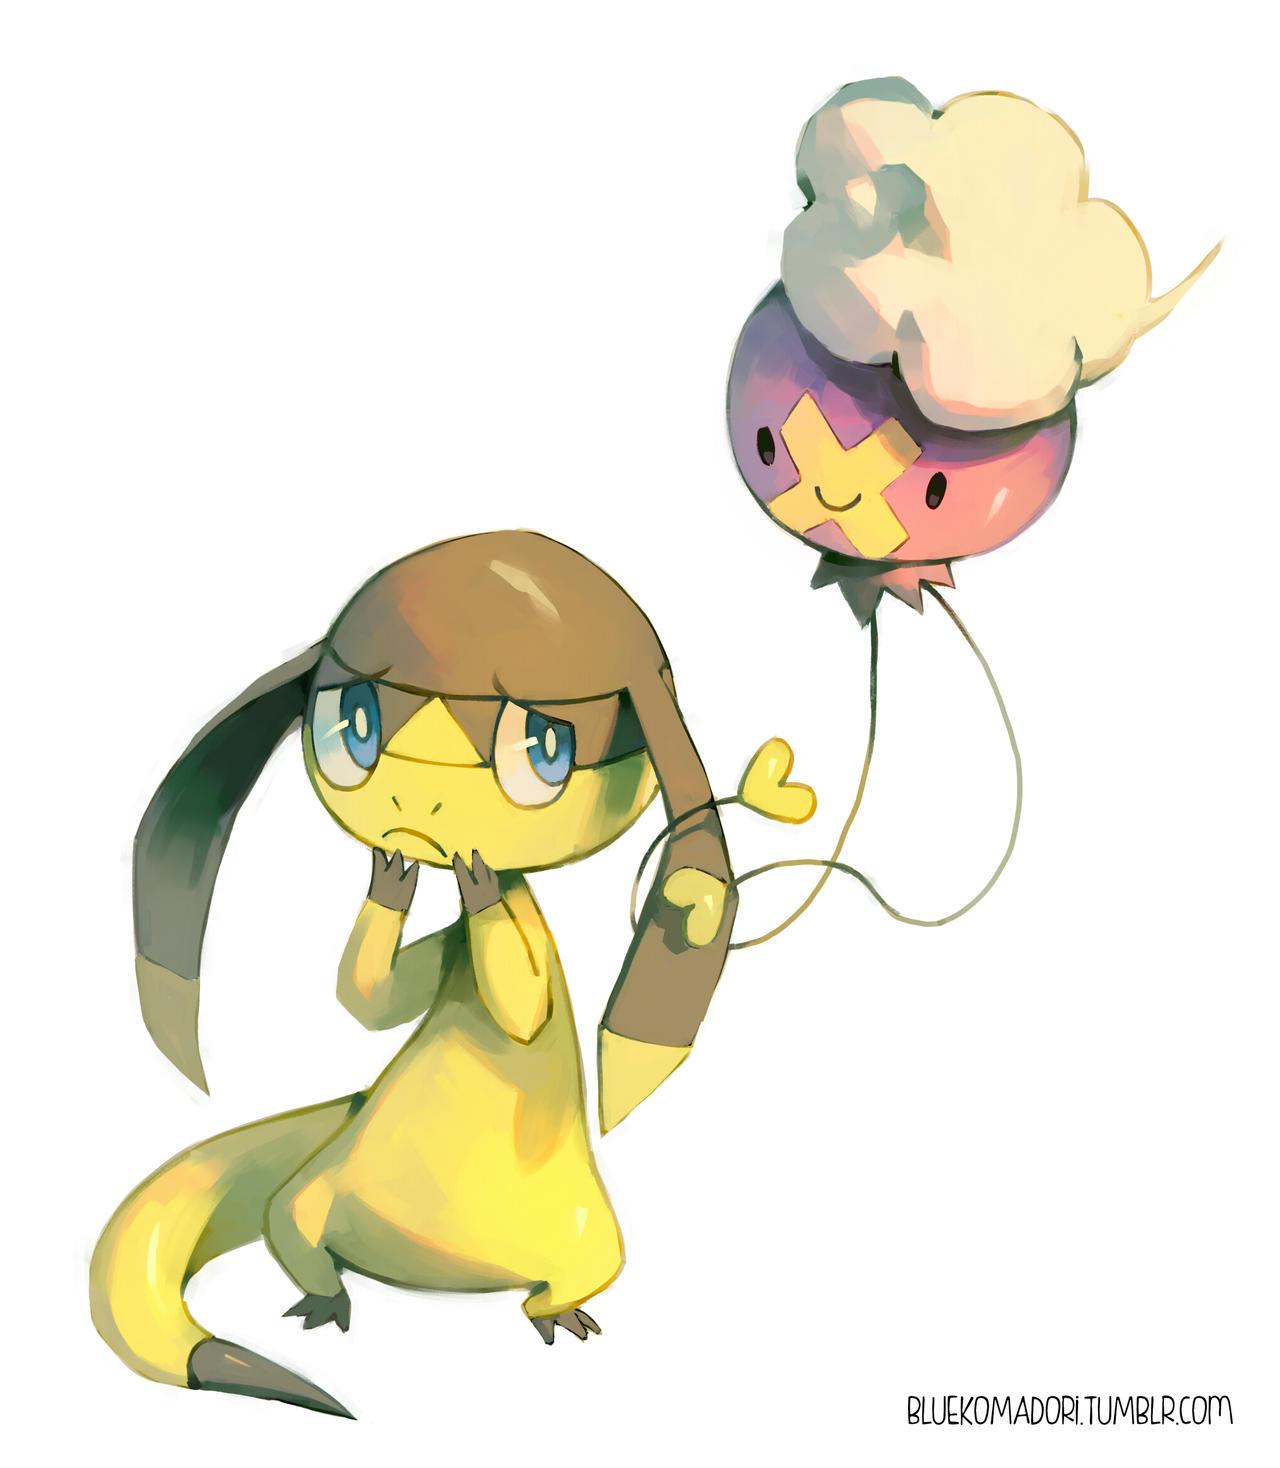 Pokemon coloring pages helioptile - Helioptile And Drifloon By Bluekomadori